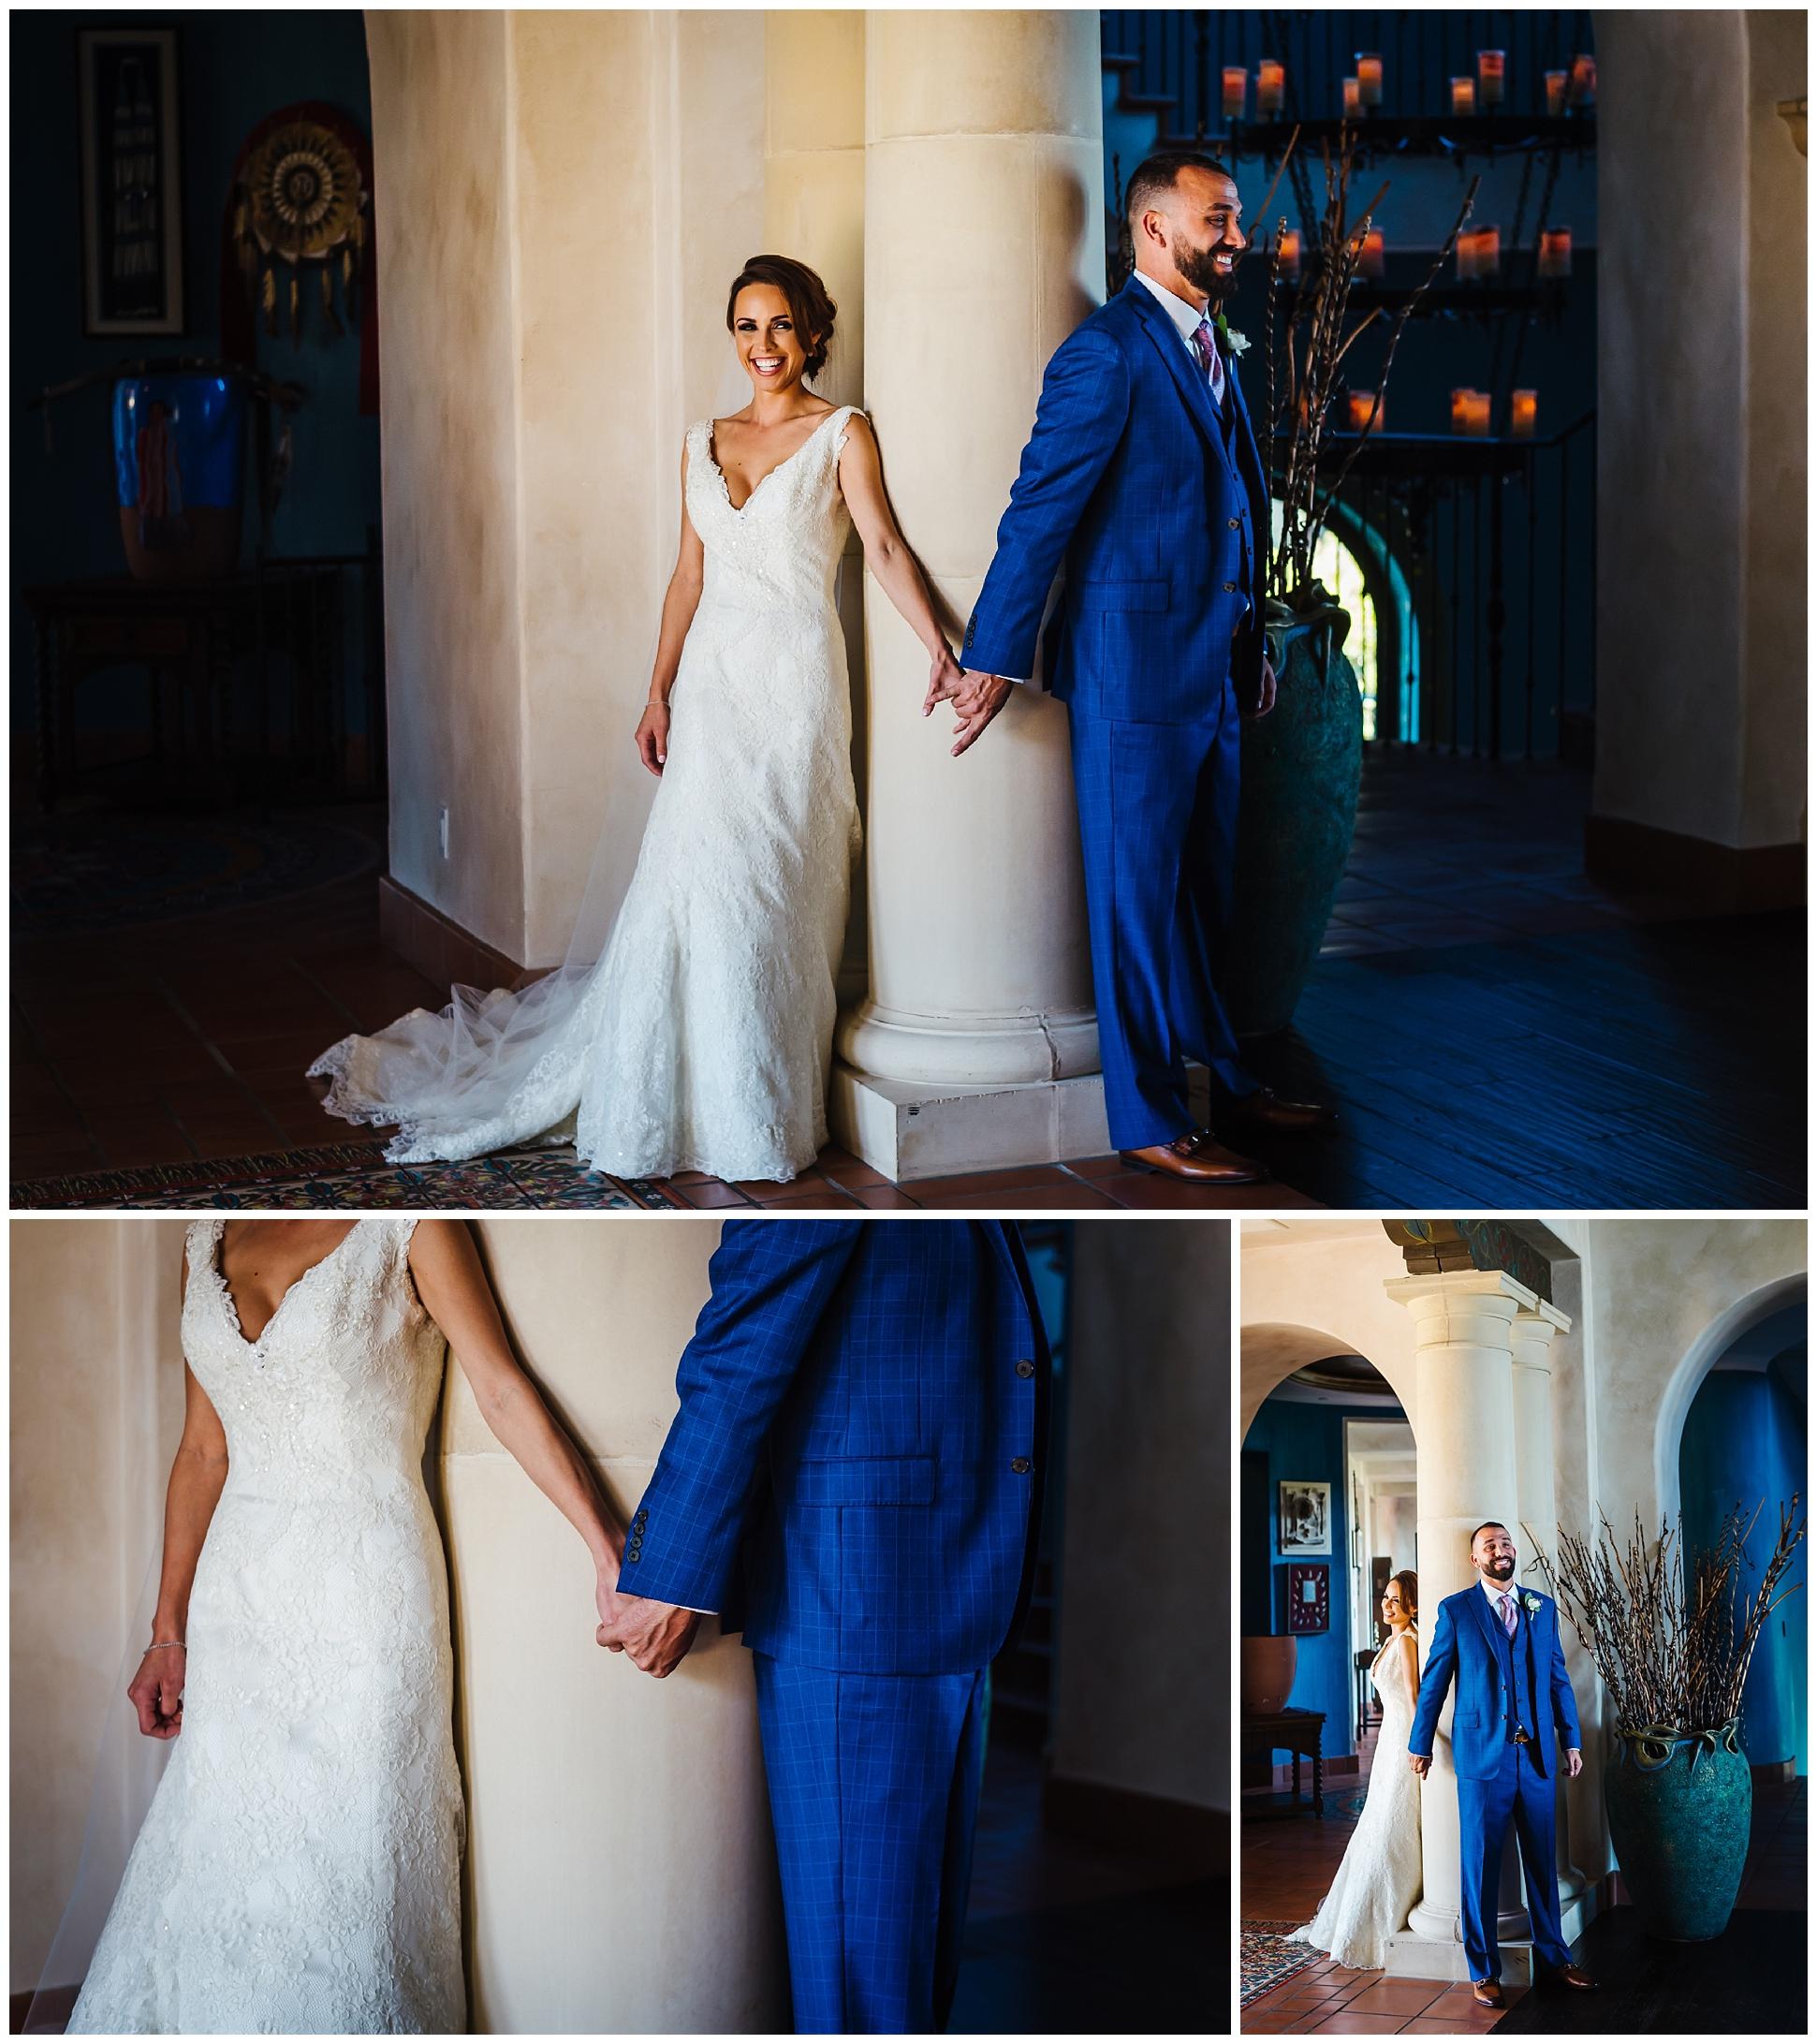 Tampa-luxury-wedding-photographer-mision-lago-private-estate_0020.jpg